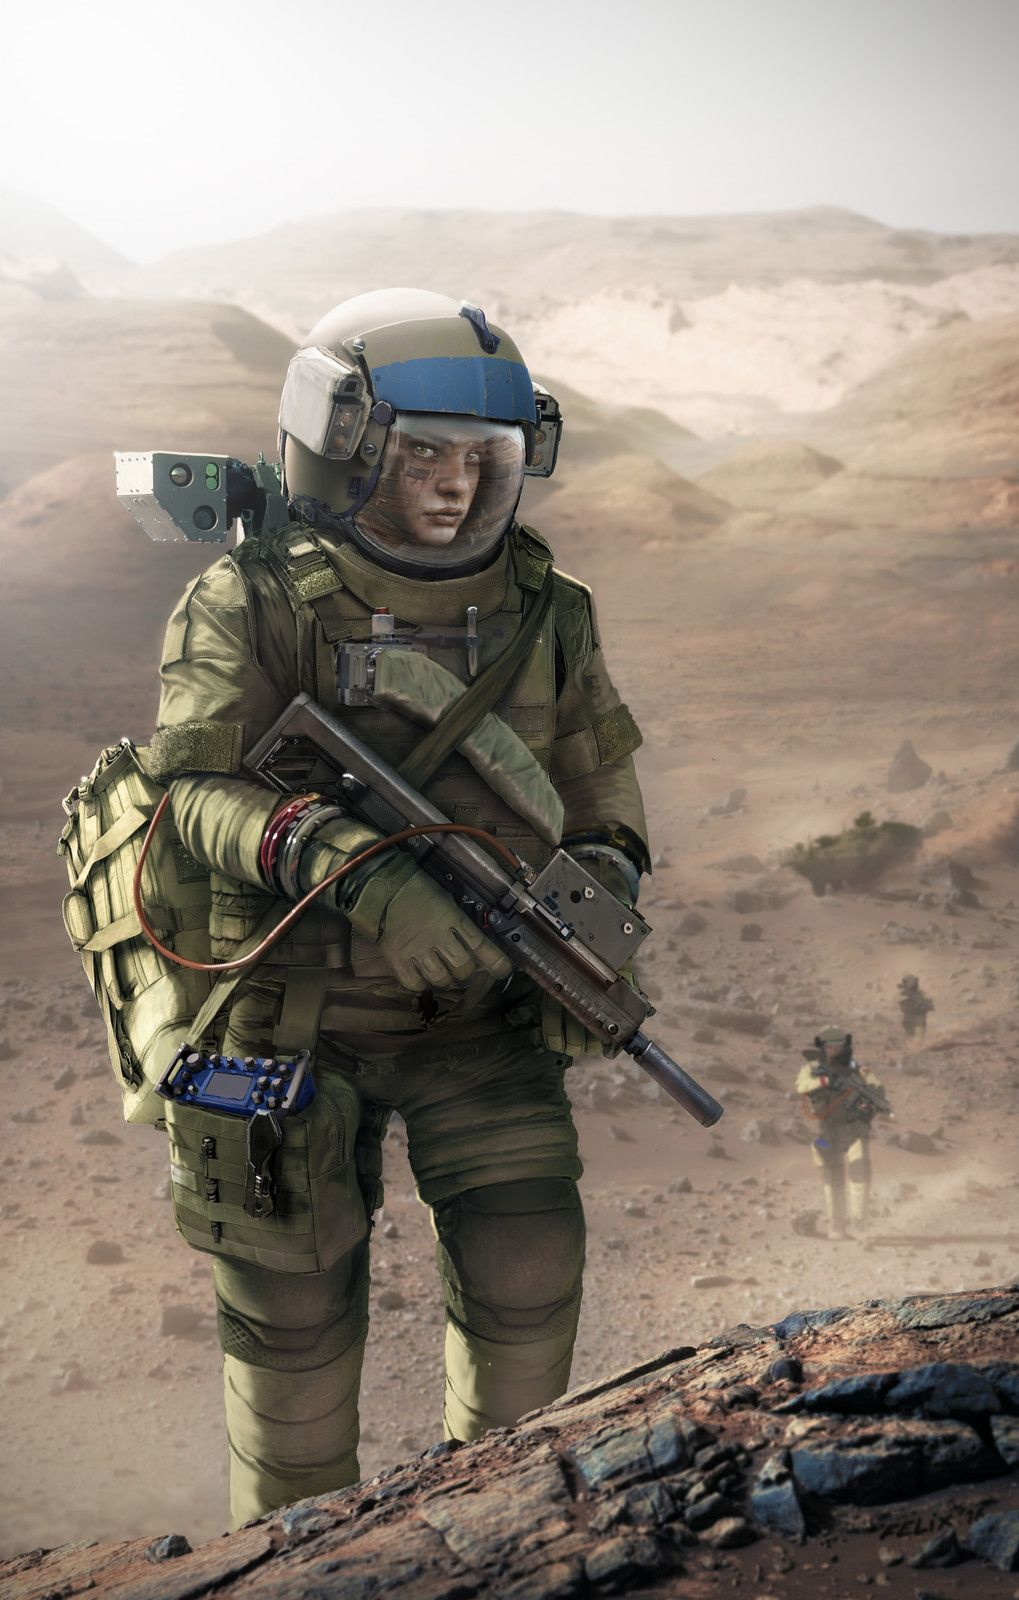 sci fi soldier concept armor future suits artstation star space futuristic cyberpunk citizen artwork soldiers suit marine combat soldados armored